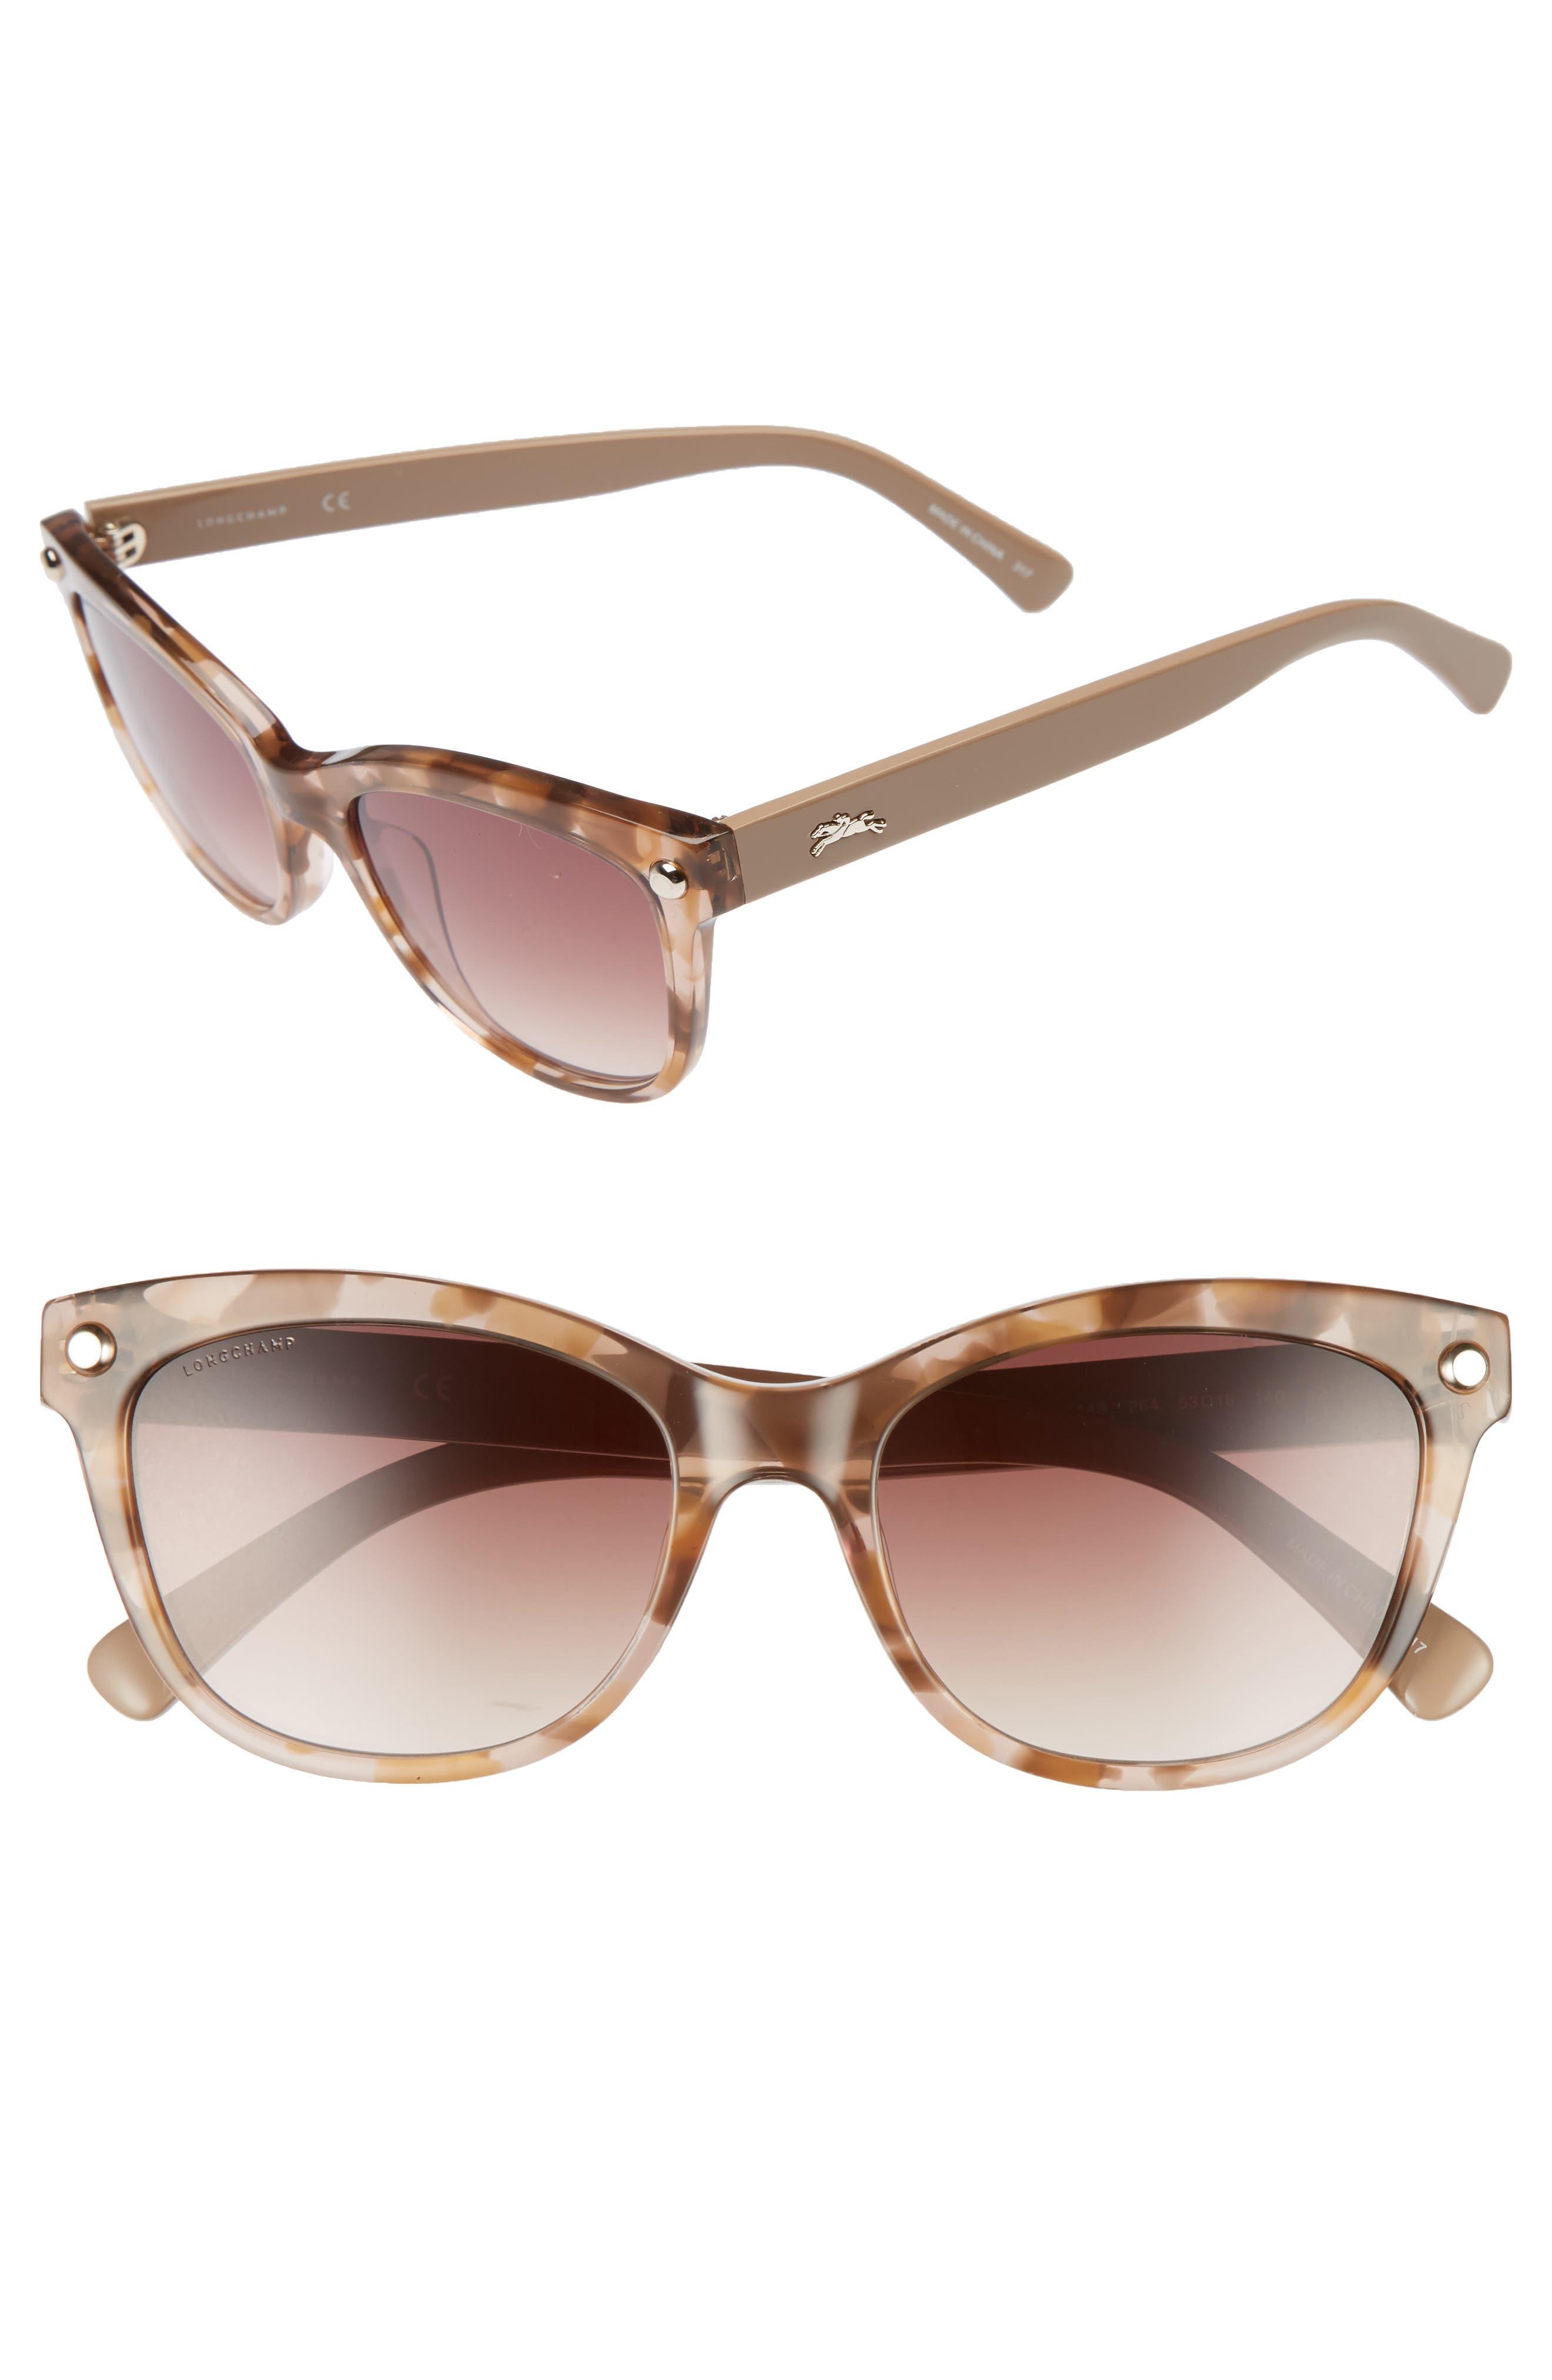 53mm Gradient Lens Cat Eye Sunglasses,                         Main,                         color, MARBLE BEIGE